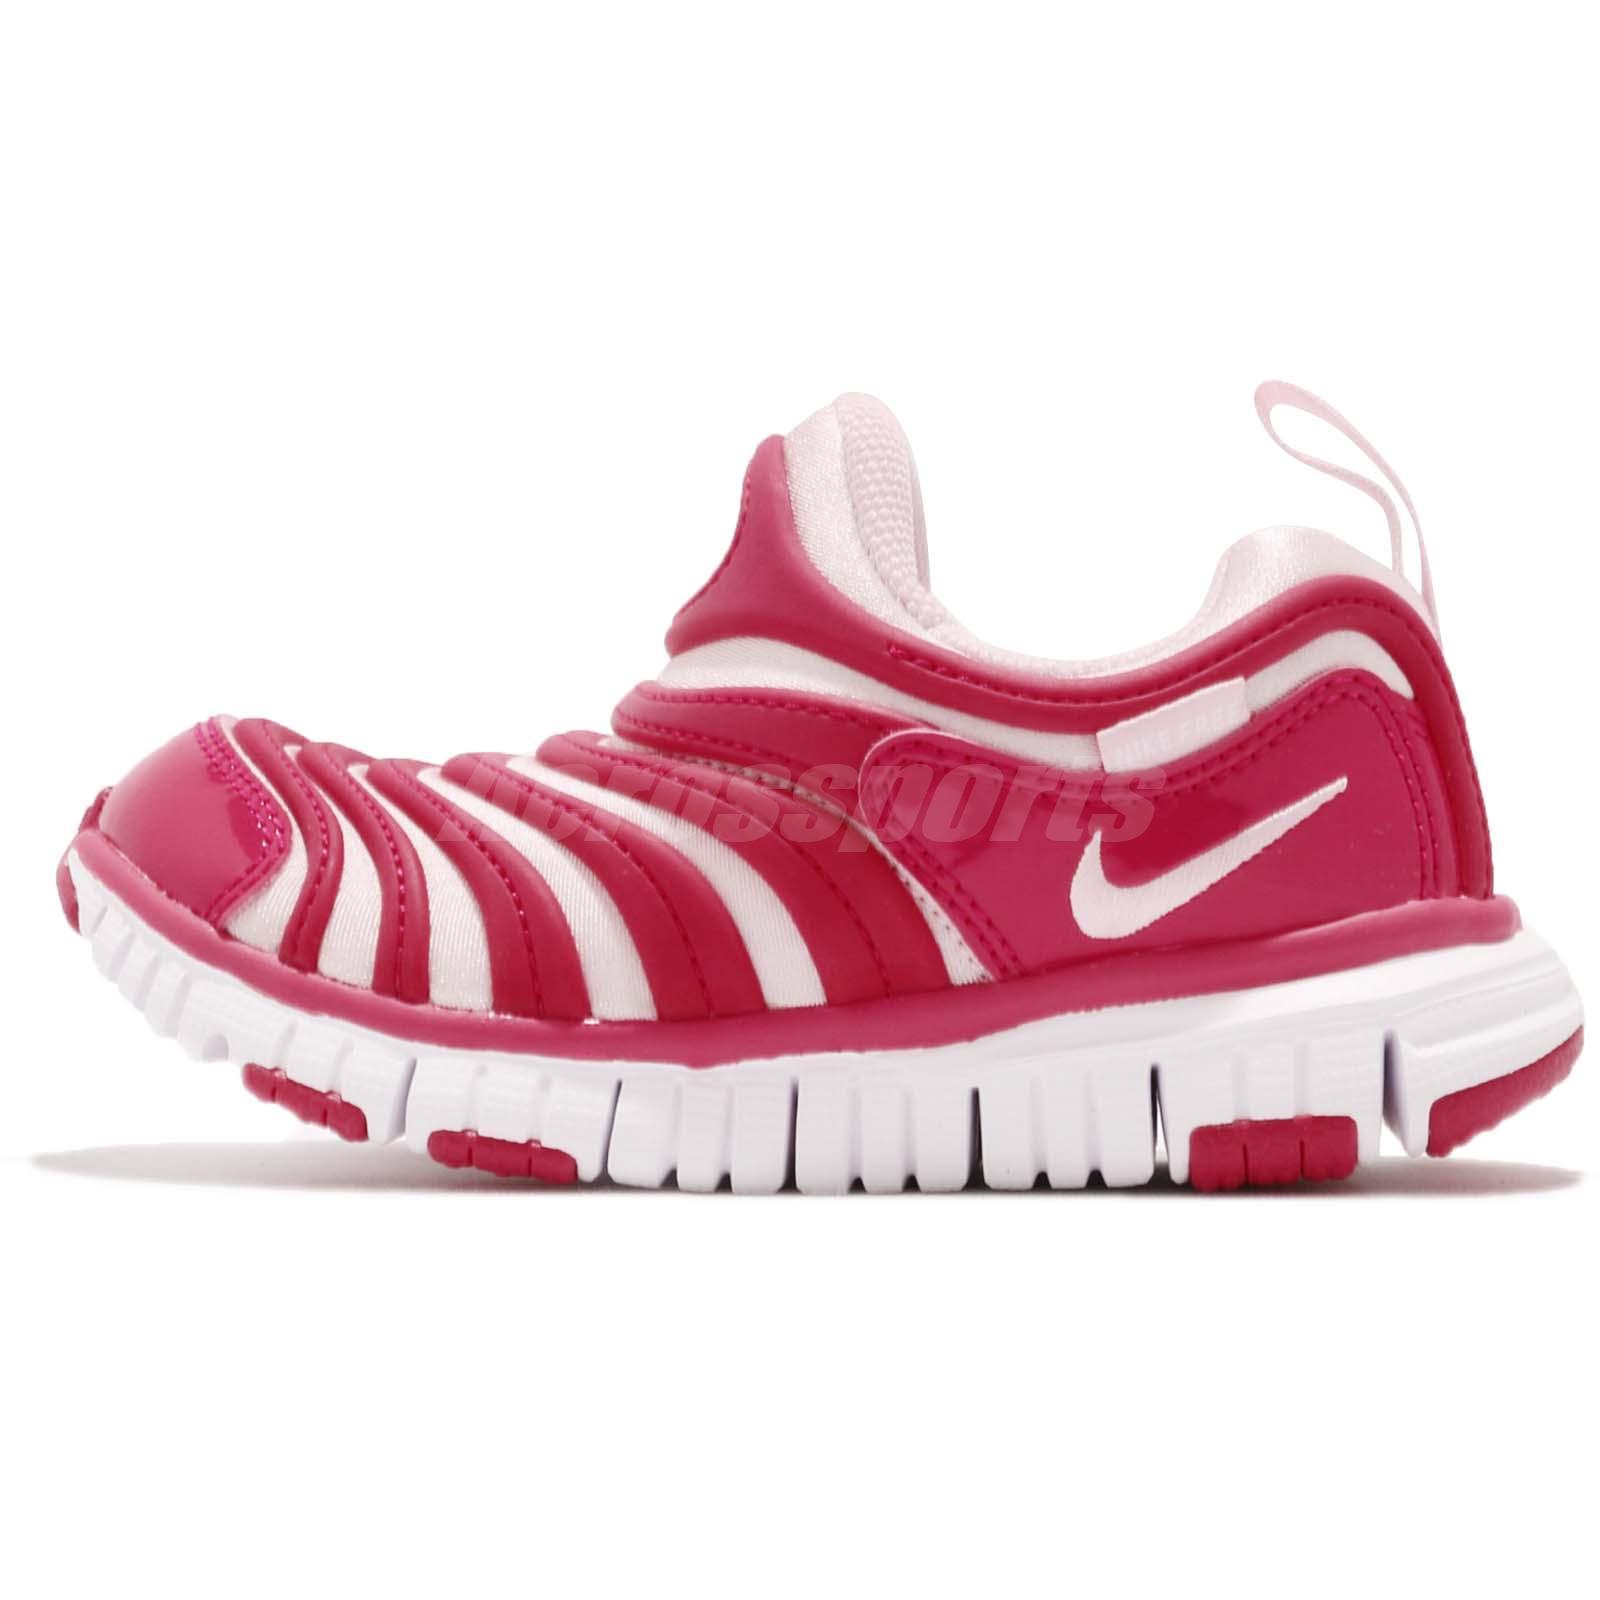 7062be2a8e71 Nike Dynamo Free PS Pink White Preschool Girls Running Shoes Sneakers  343738-626